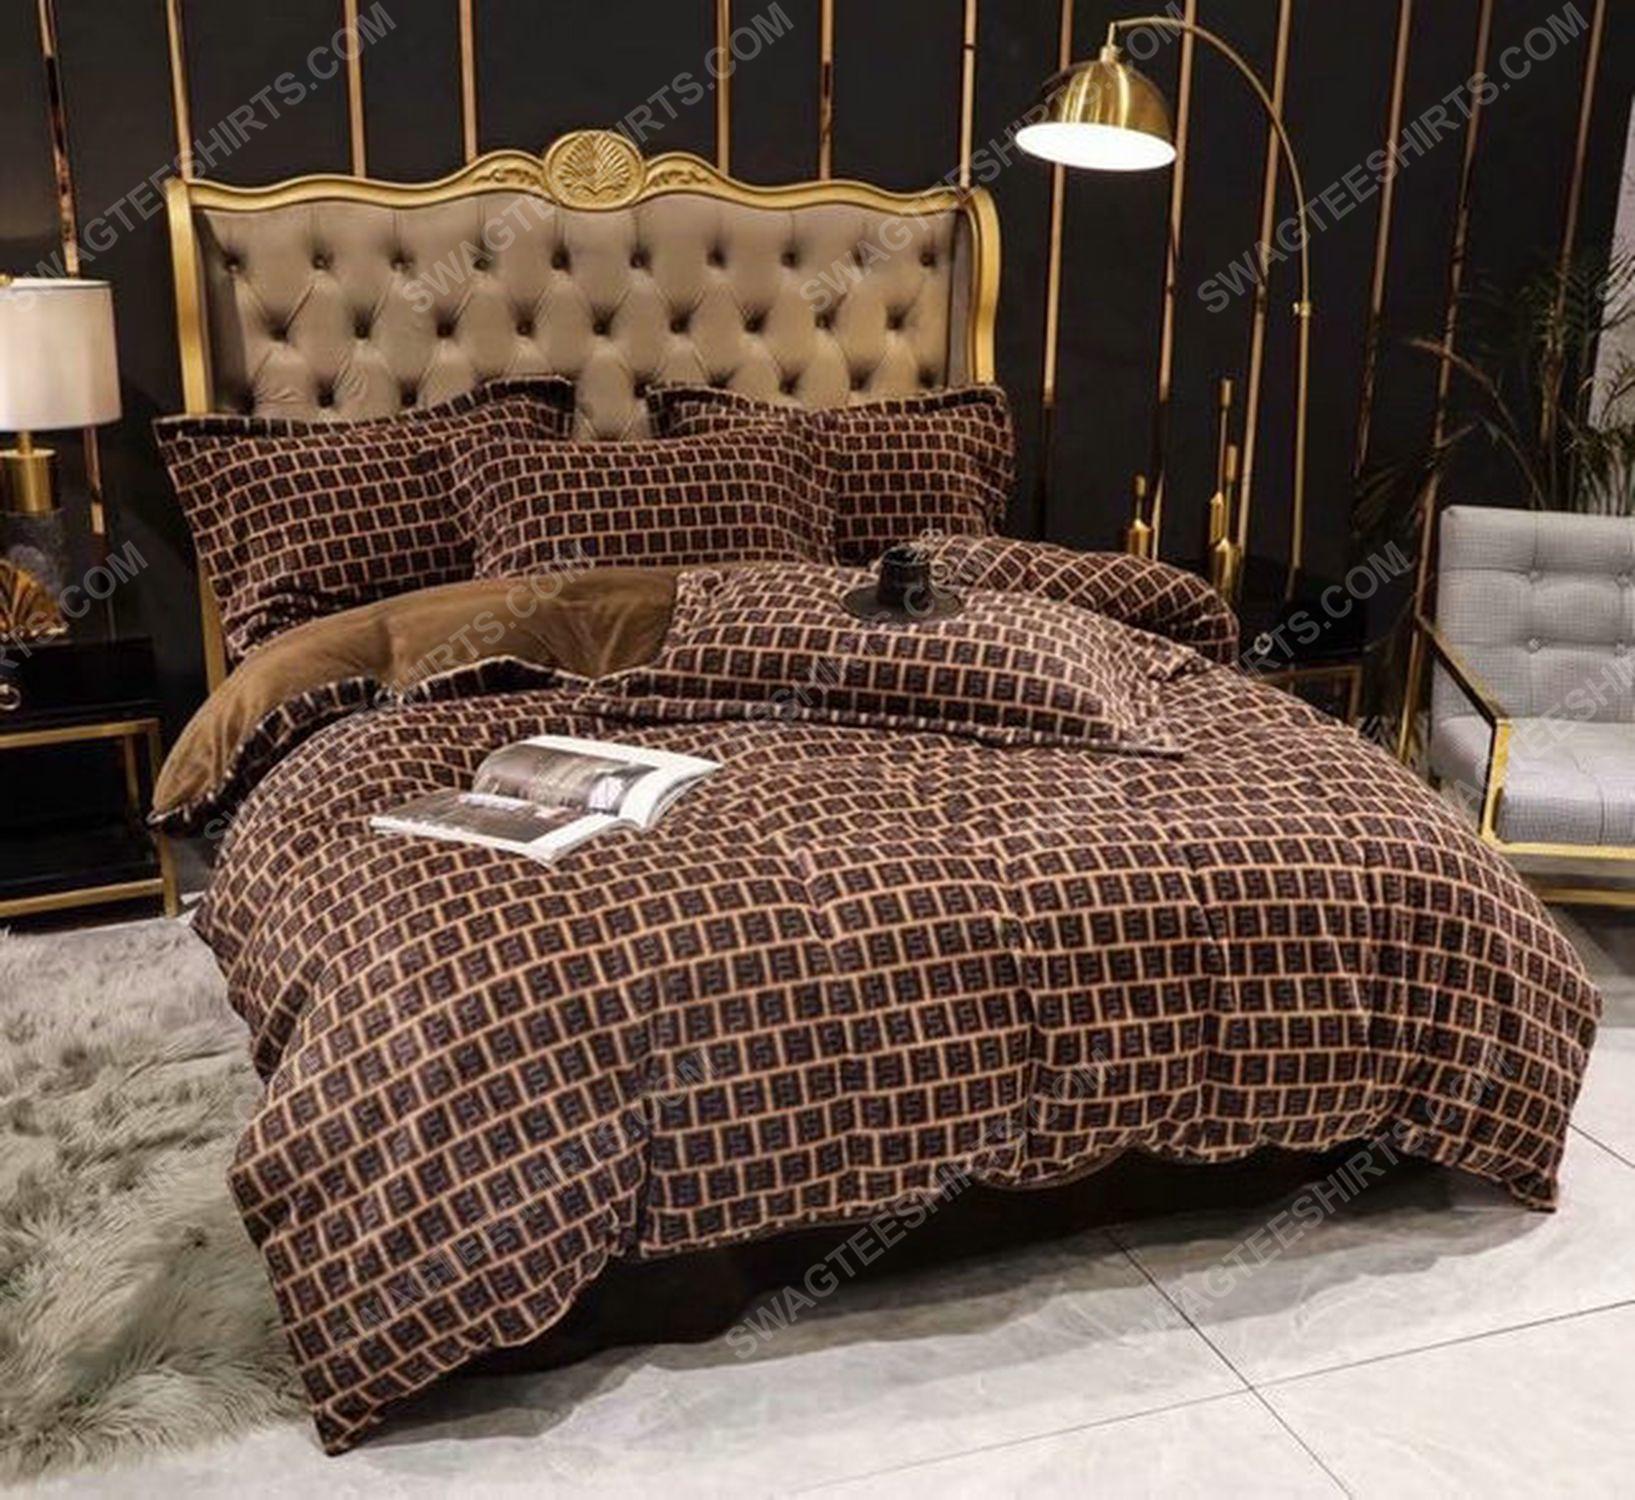 Fendi monogram symbols full print duvet cover bedding set 2 - Copy